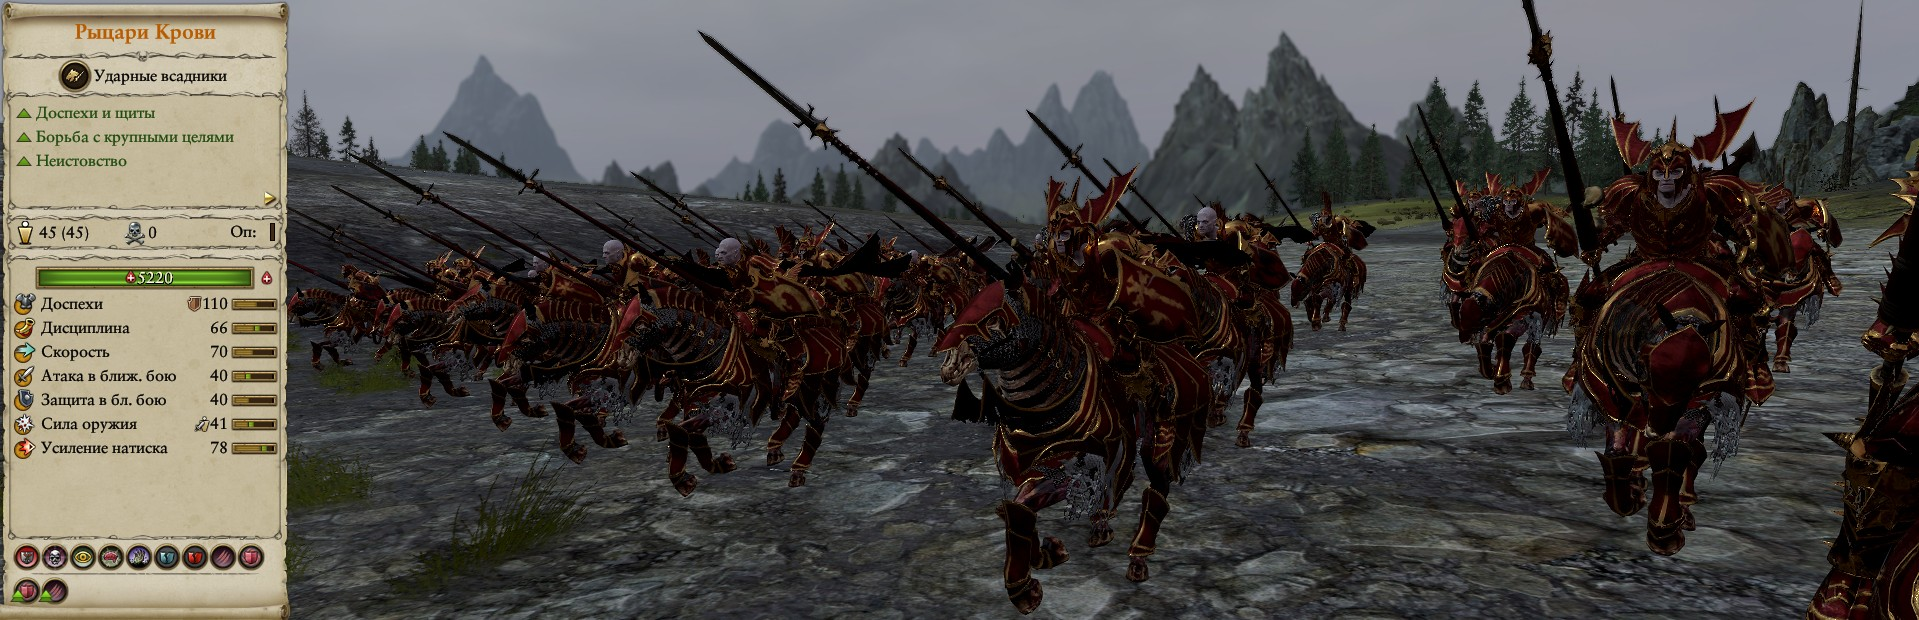 Рыцари Крови отряды warhammer total war 2